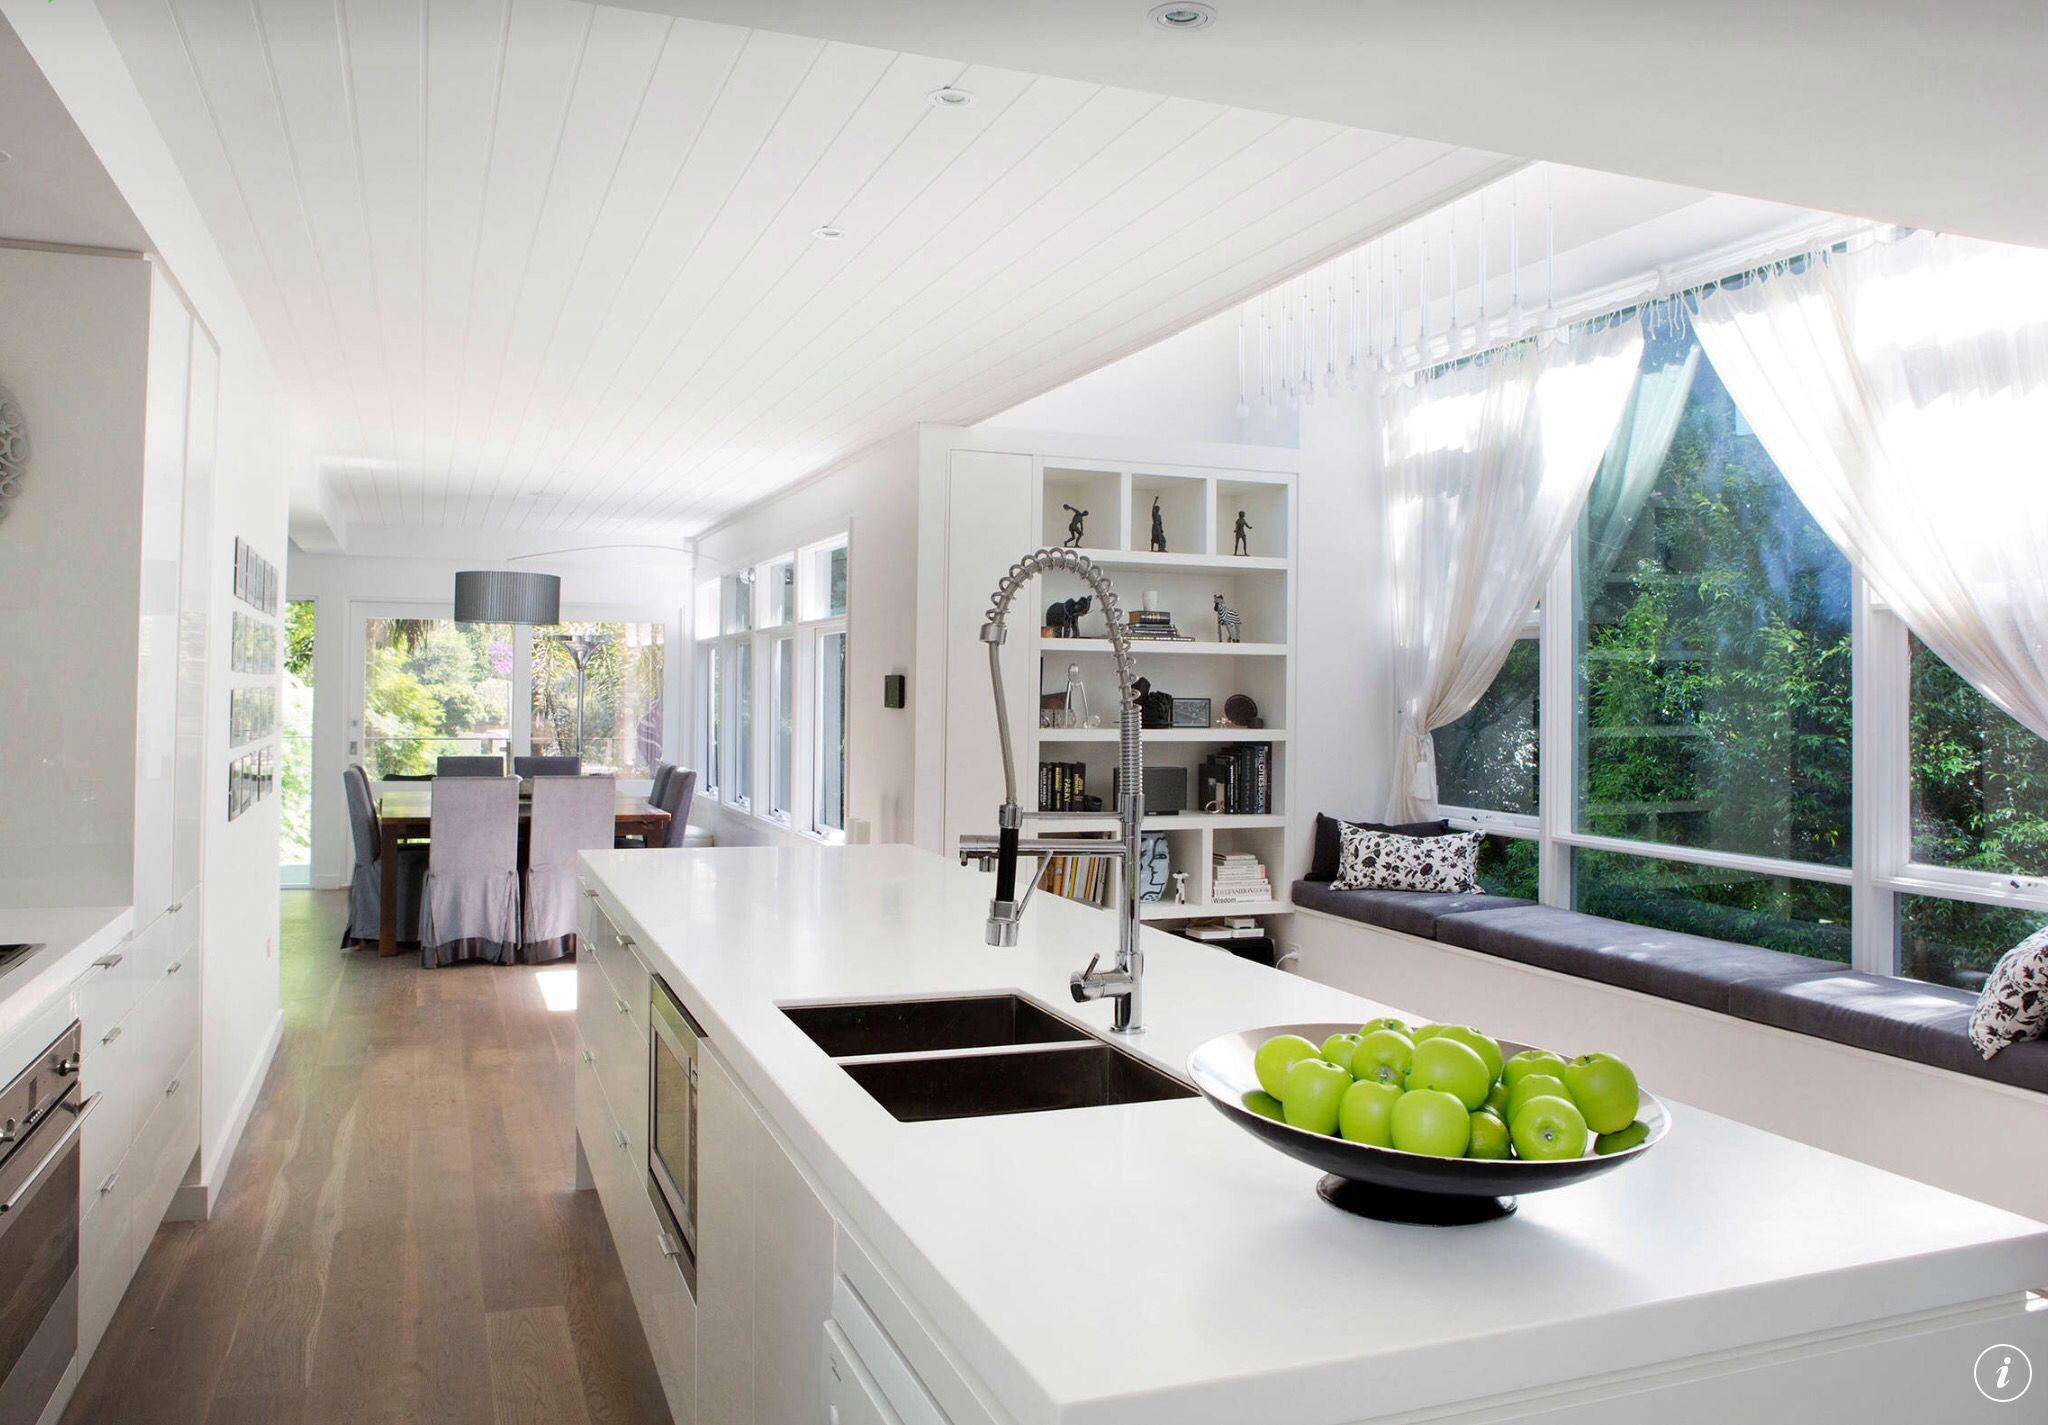 White kitchen, window seat